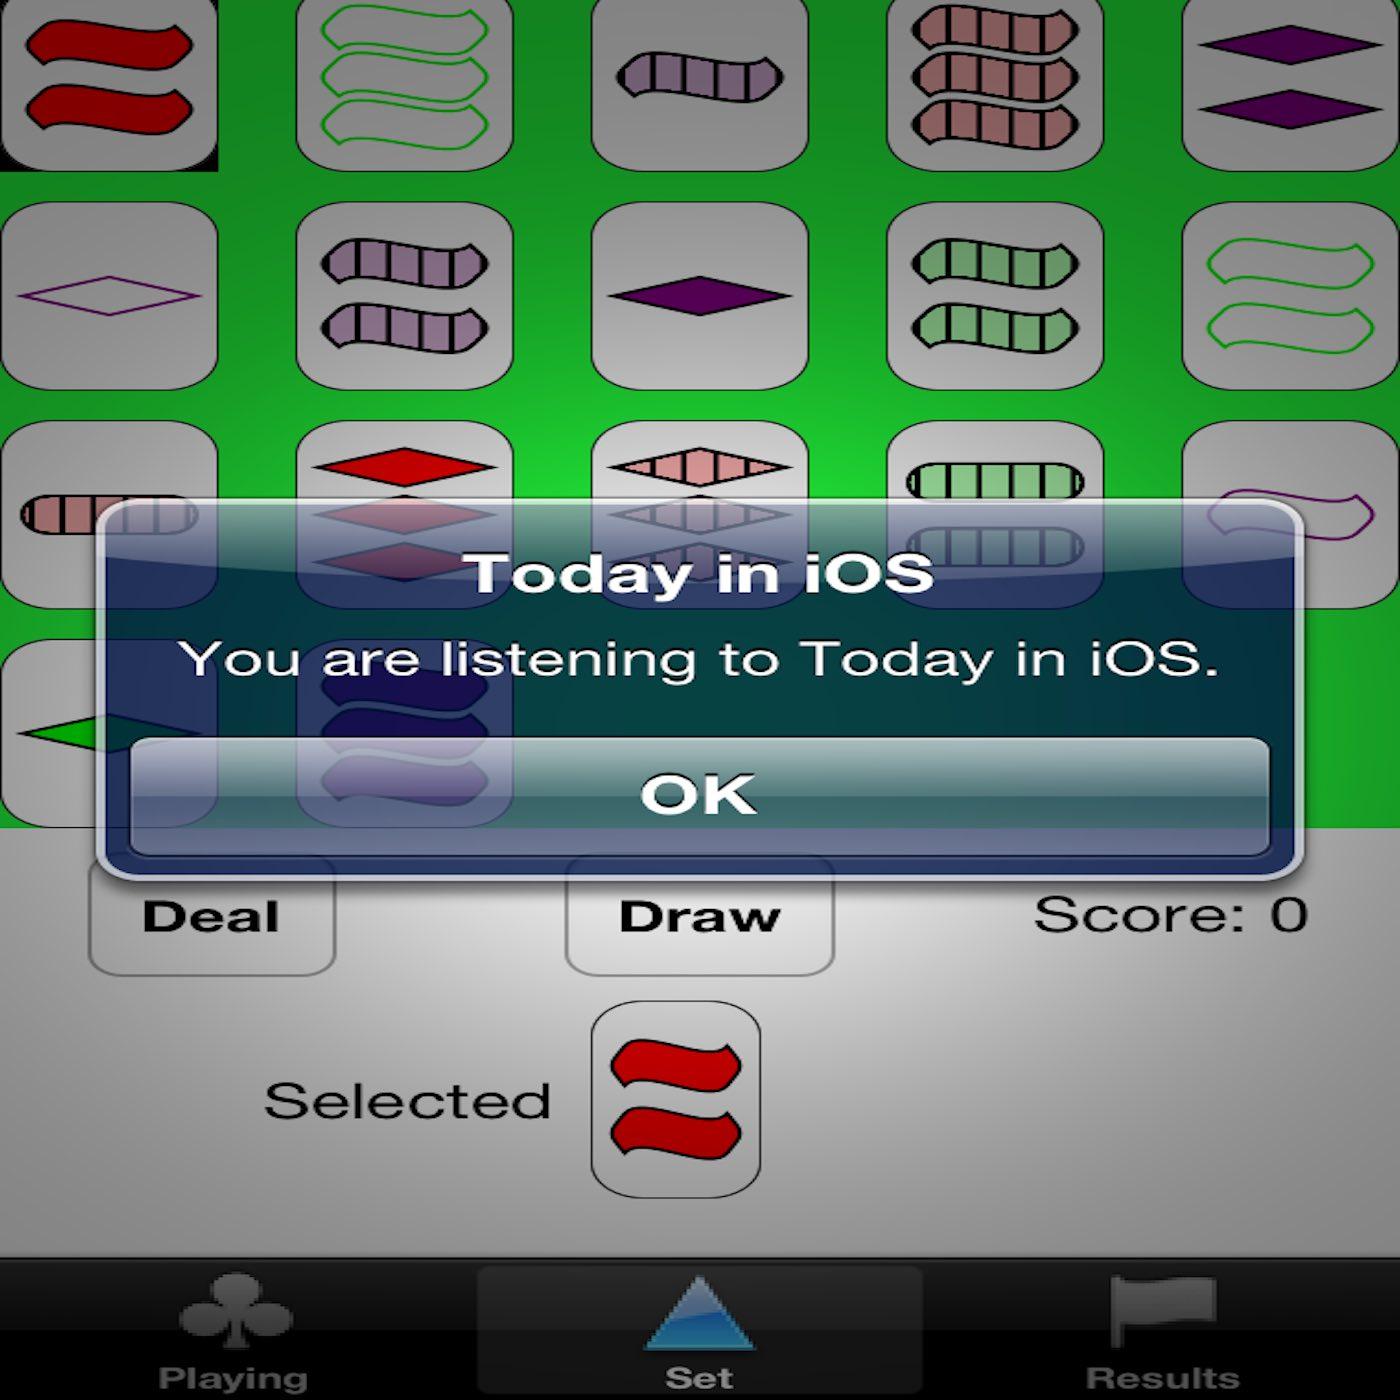 Tii 0499 - Apple Watch series 6 and SE, iPad Air, Apple Fitness+, iOS 14